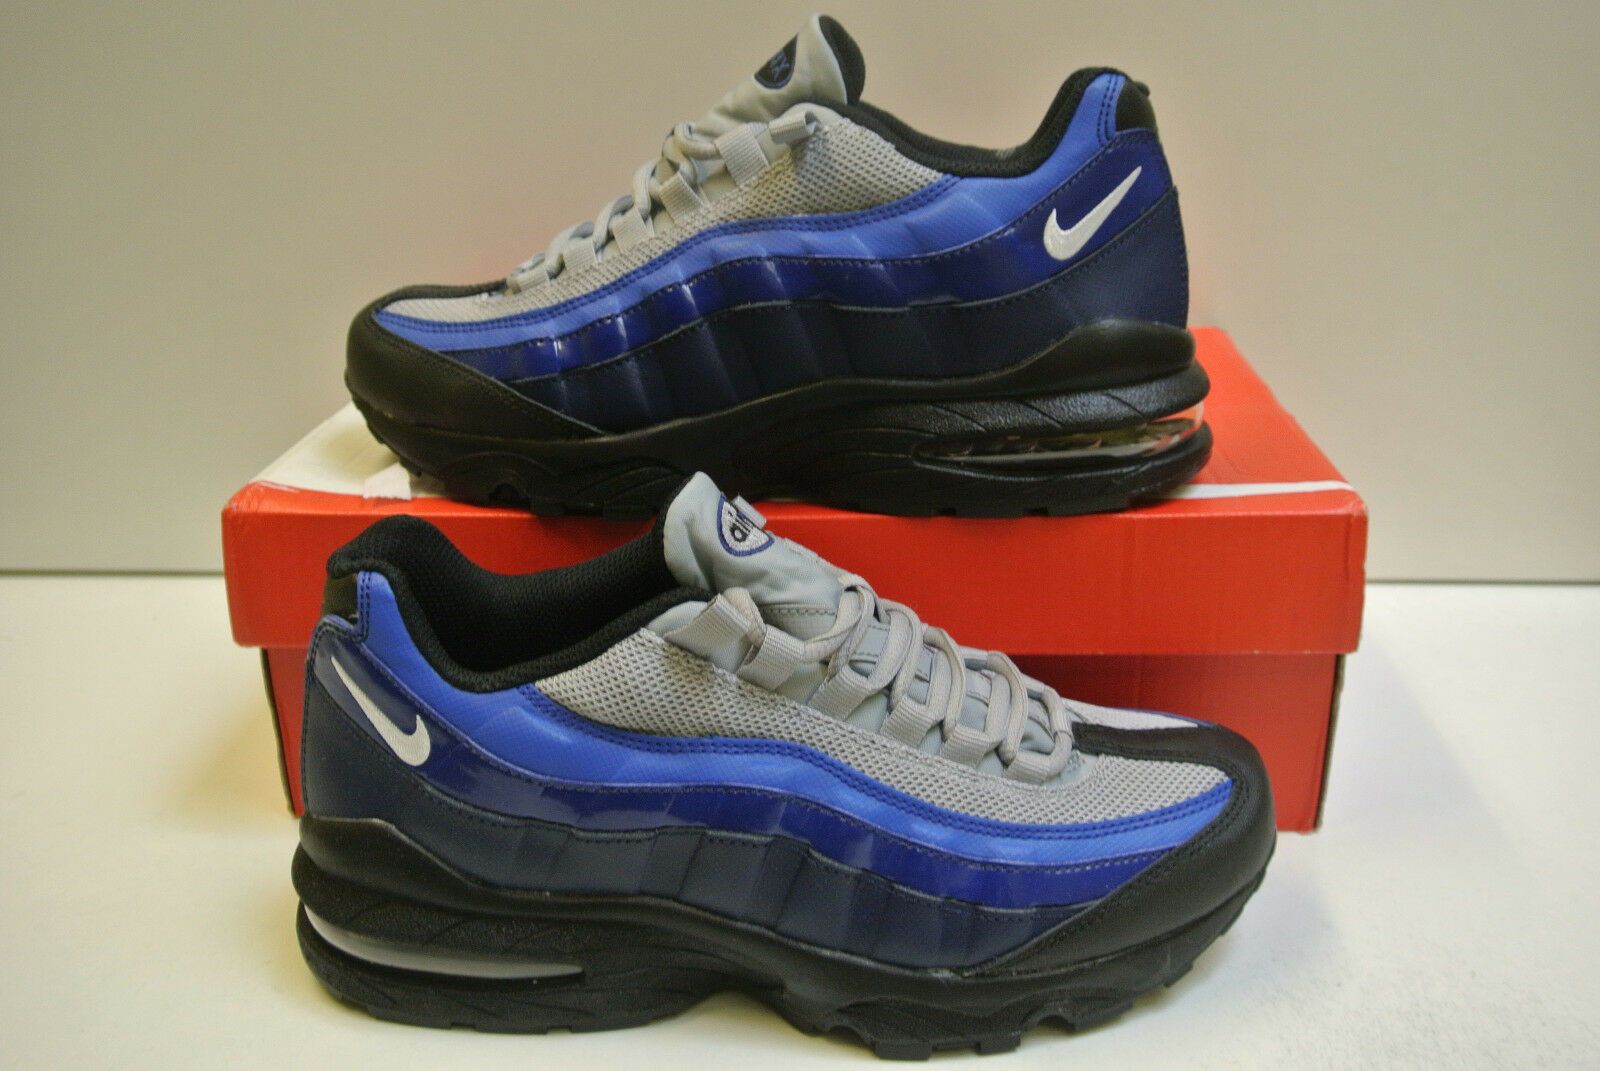 Nike Air Max 95 gr. SÉLECTIONNABLE neuf 006 et emballage d'origine 905348 006 neuf 5eb43b